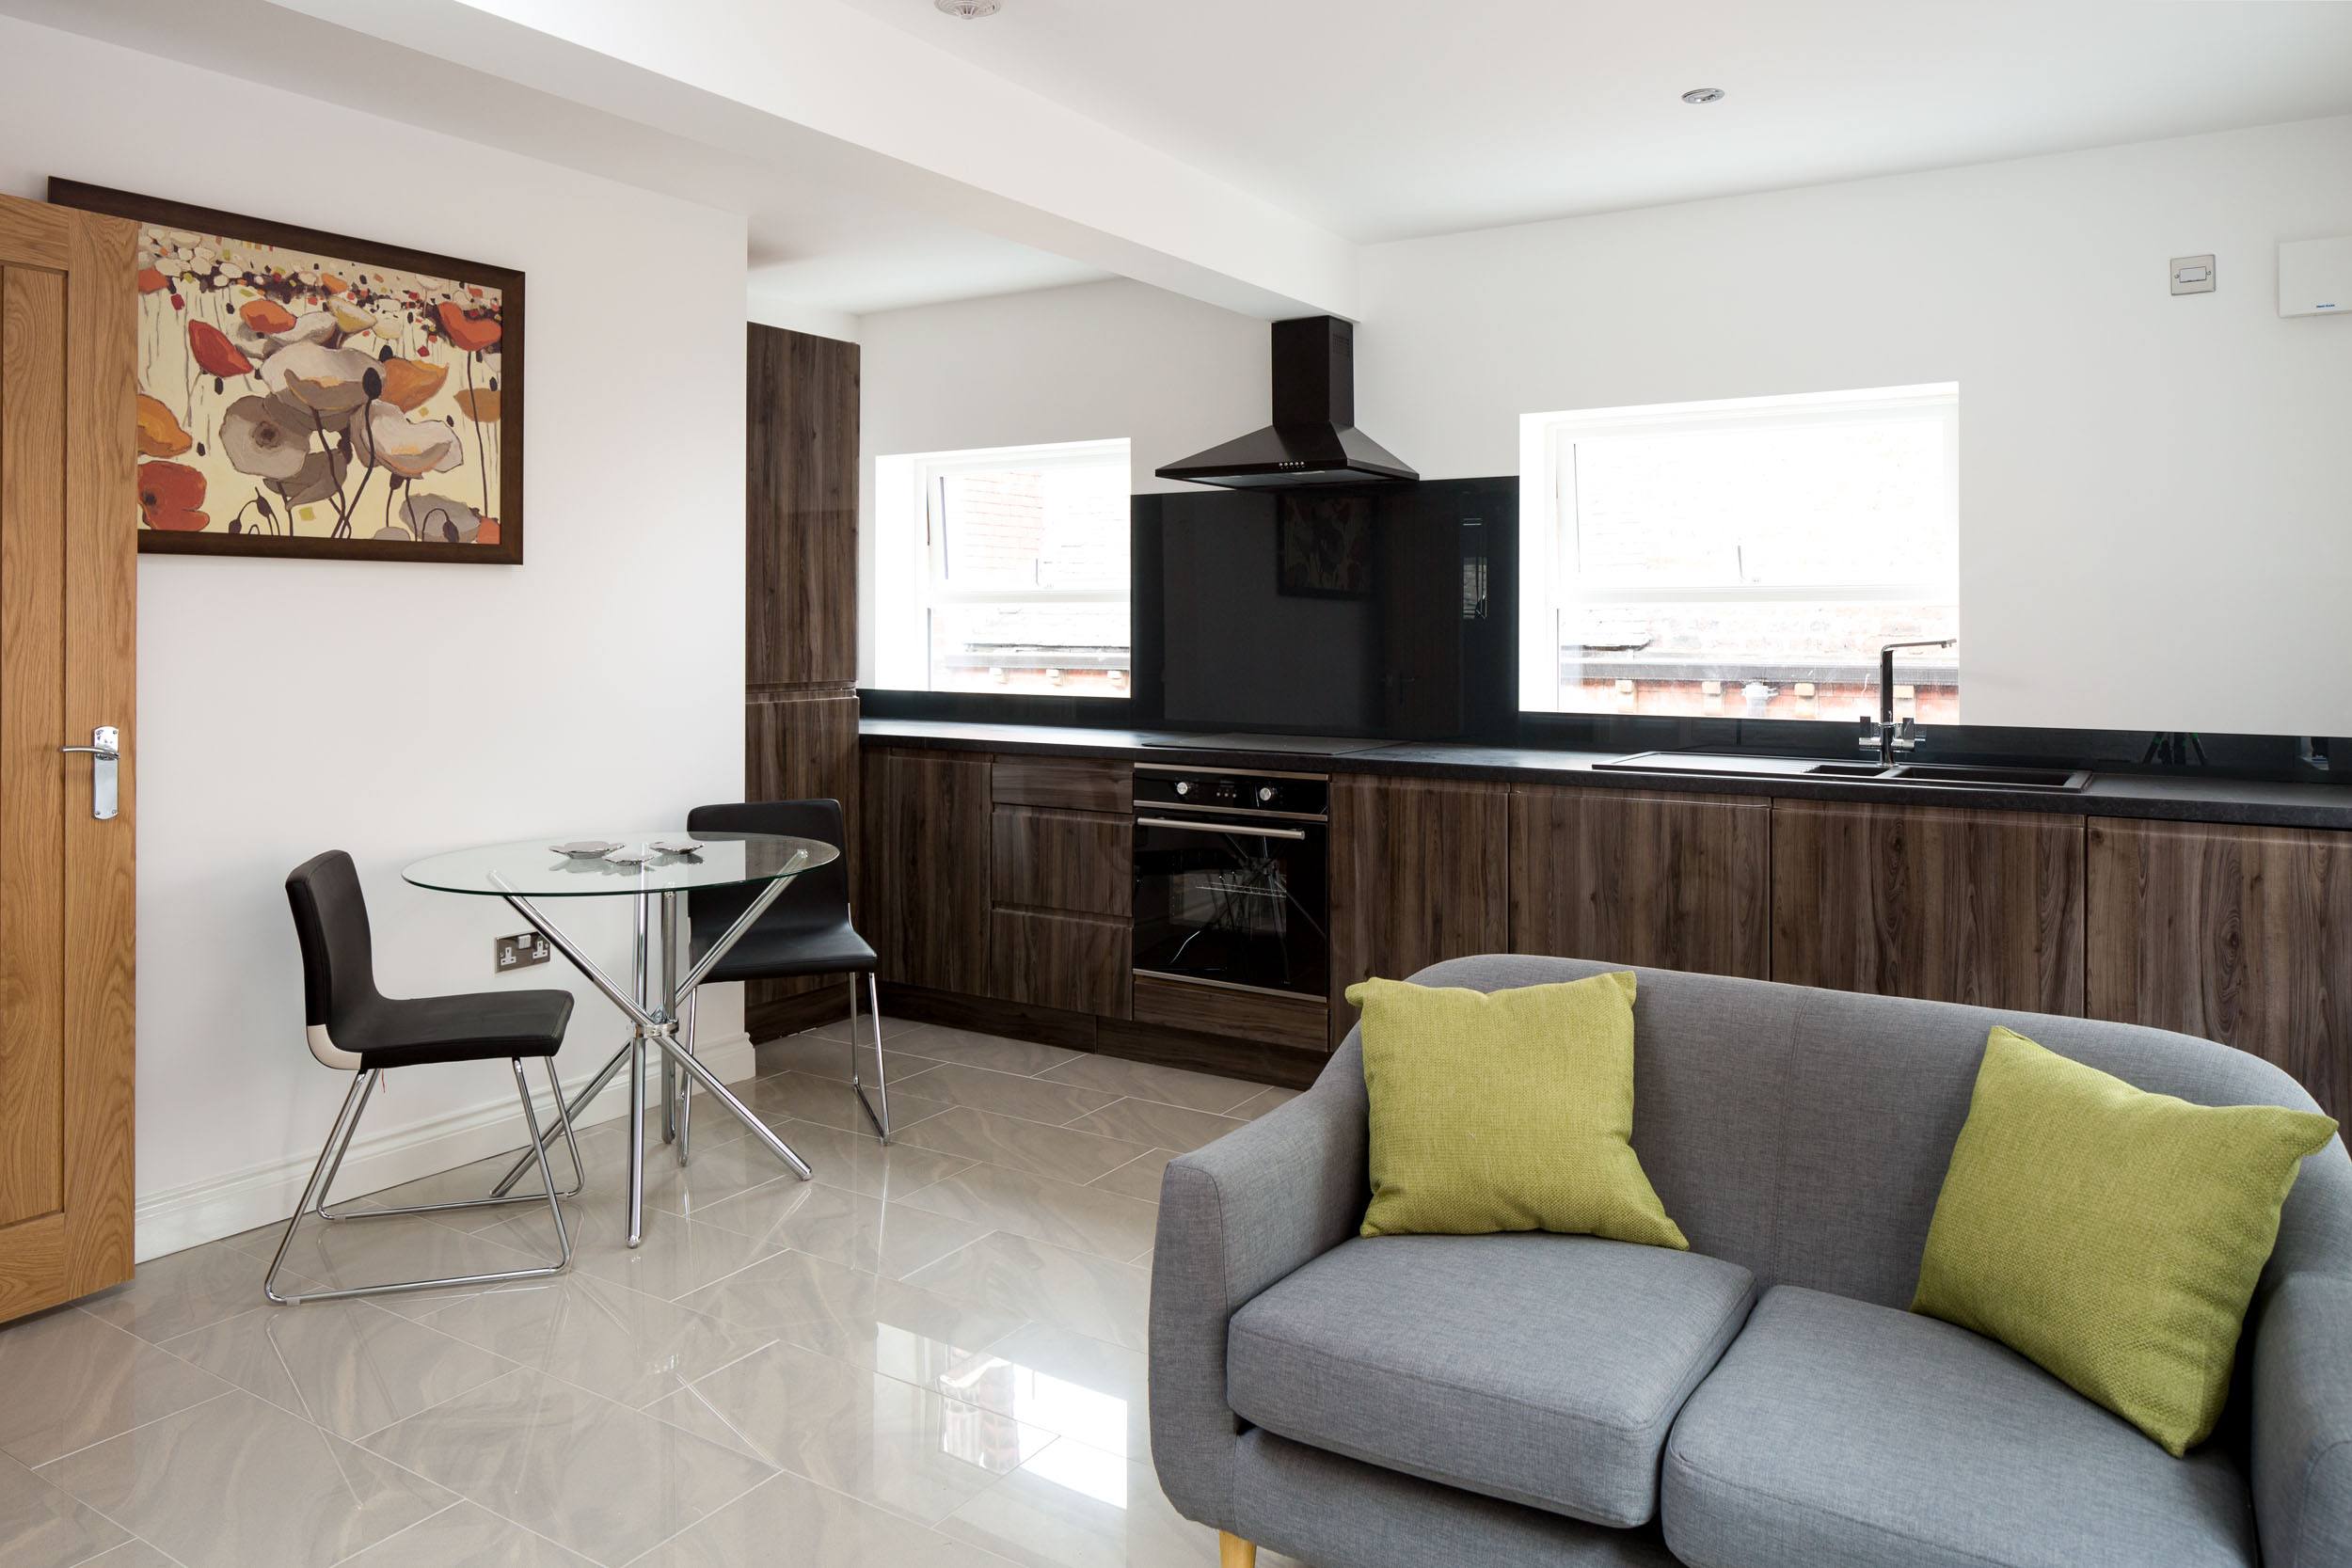 leeds city centre apartment residential interior.jpg